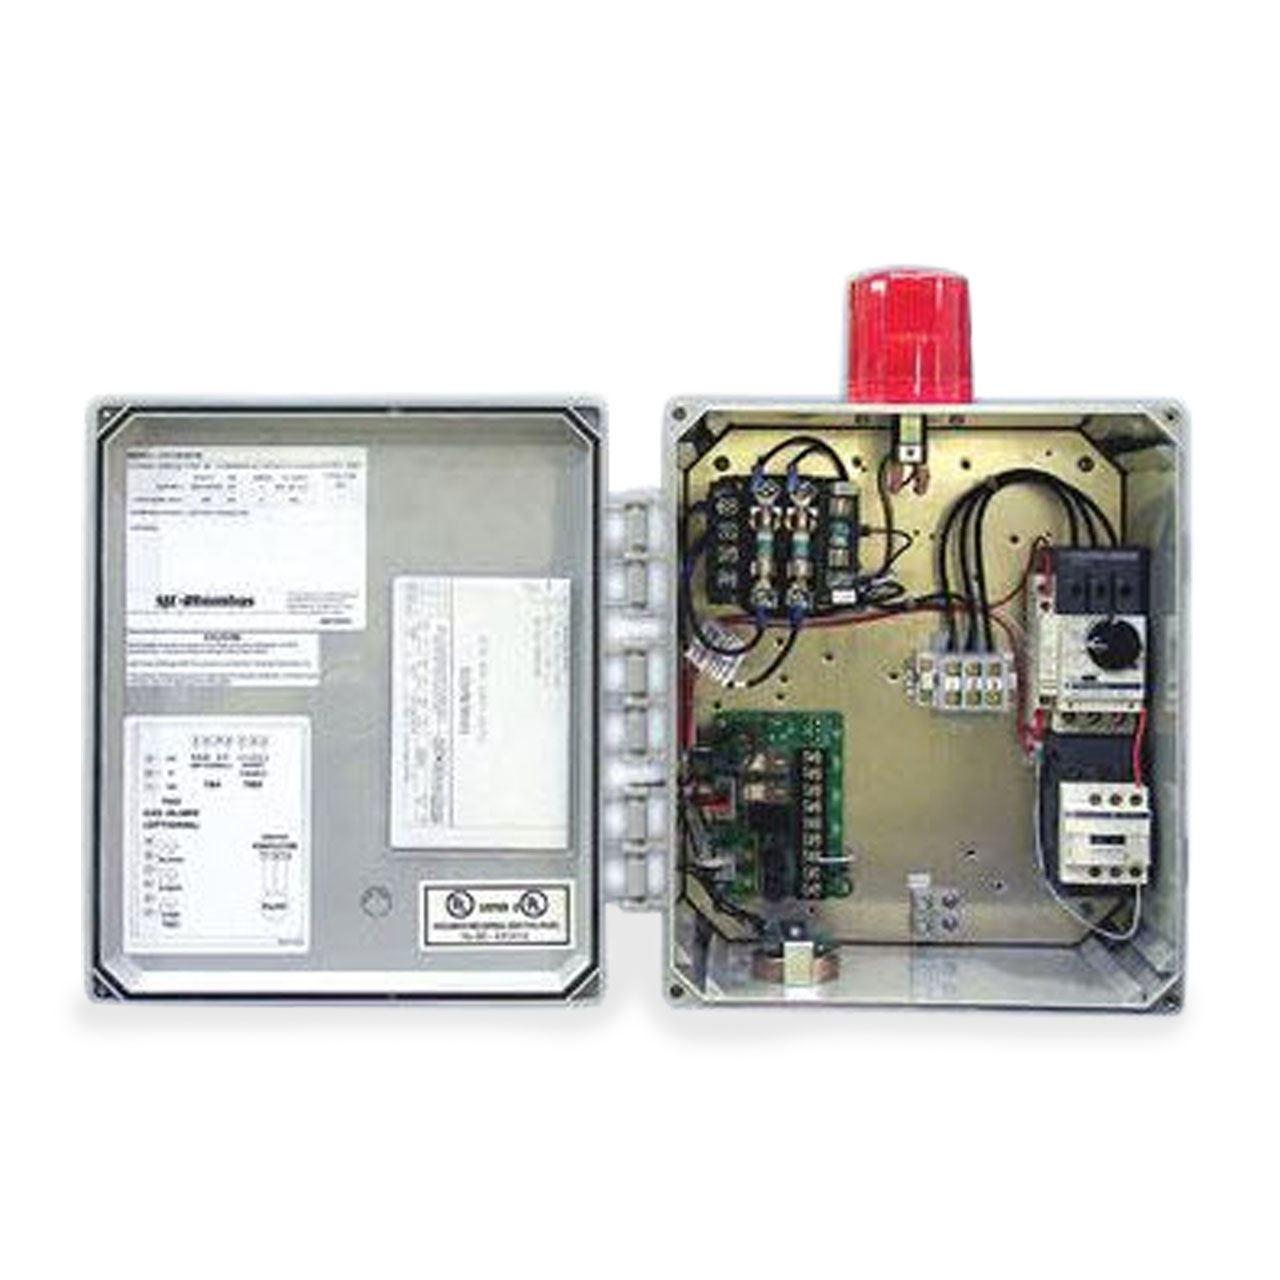 Simplex Float Wiring Diagram Data Diagrams Sje Rhombus Model 312 3 Phase 208 240 480 600v Activated Alarm